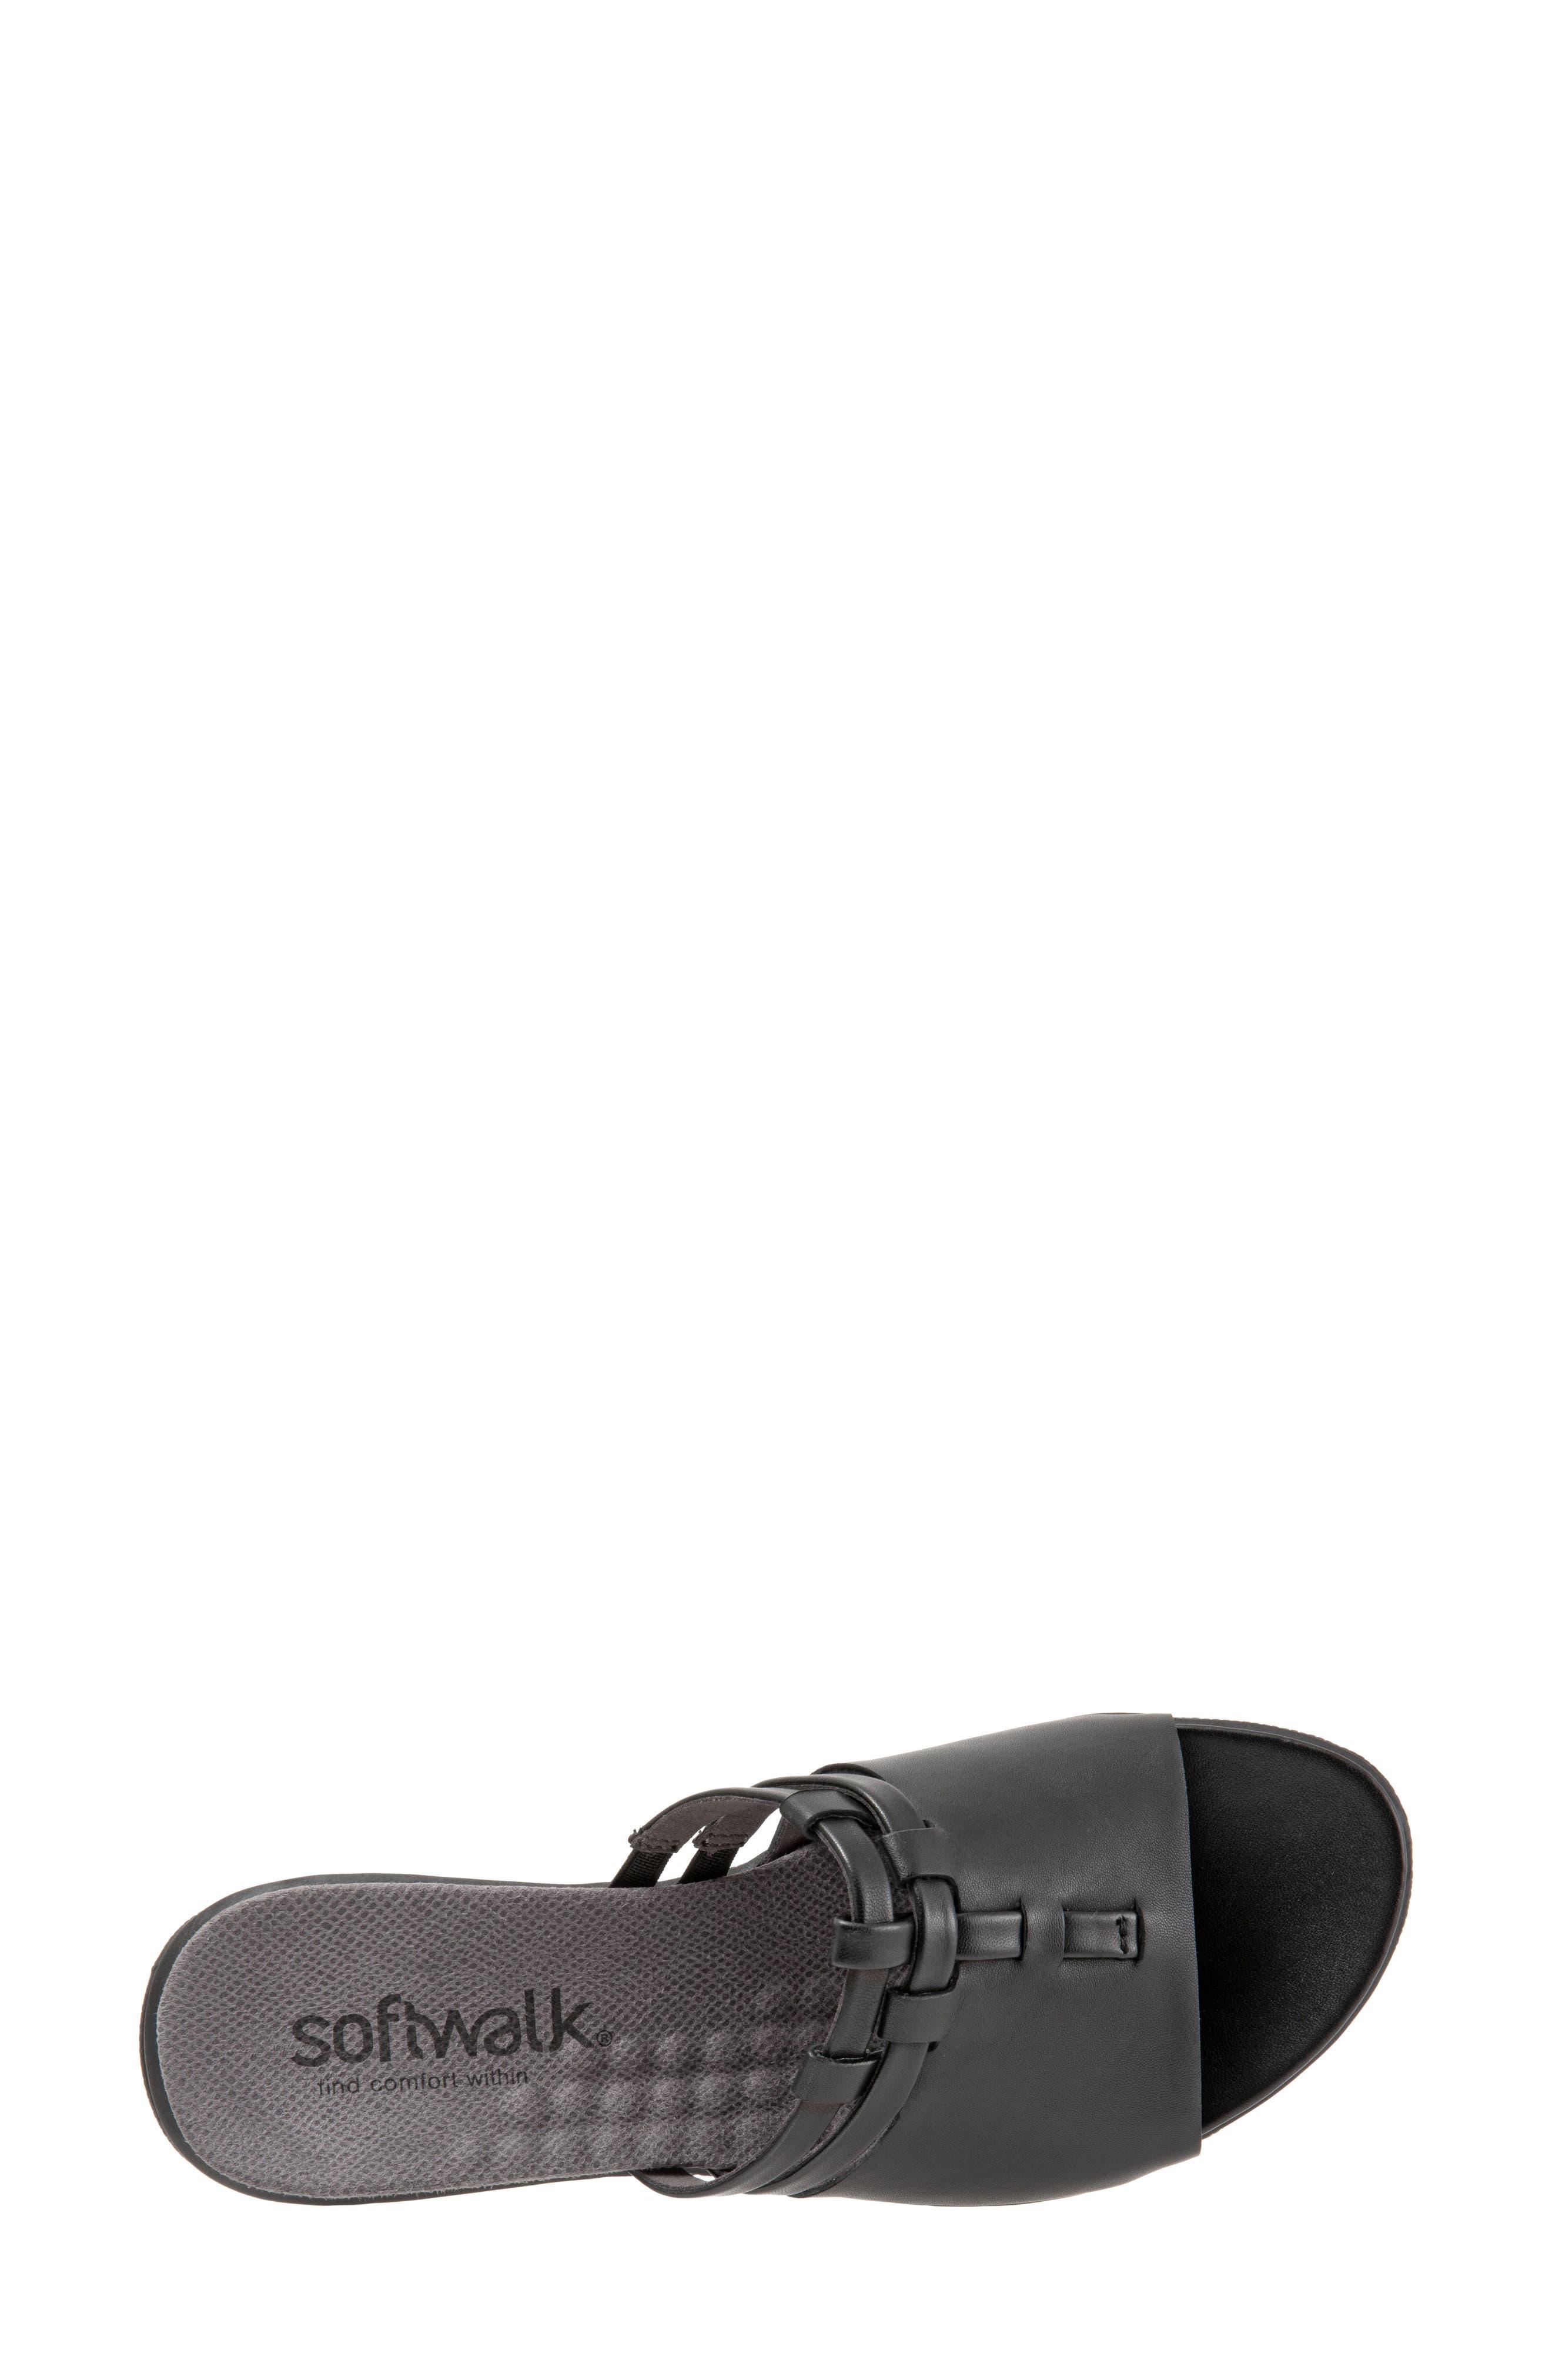 SOFTWALK<SUP>®</SUP>, Tahoma Woven Slide Sandal, Alternate thumbnail 5, color, BLACK LEATHER